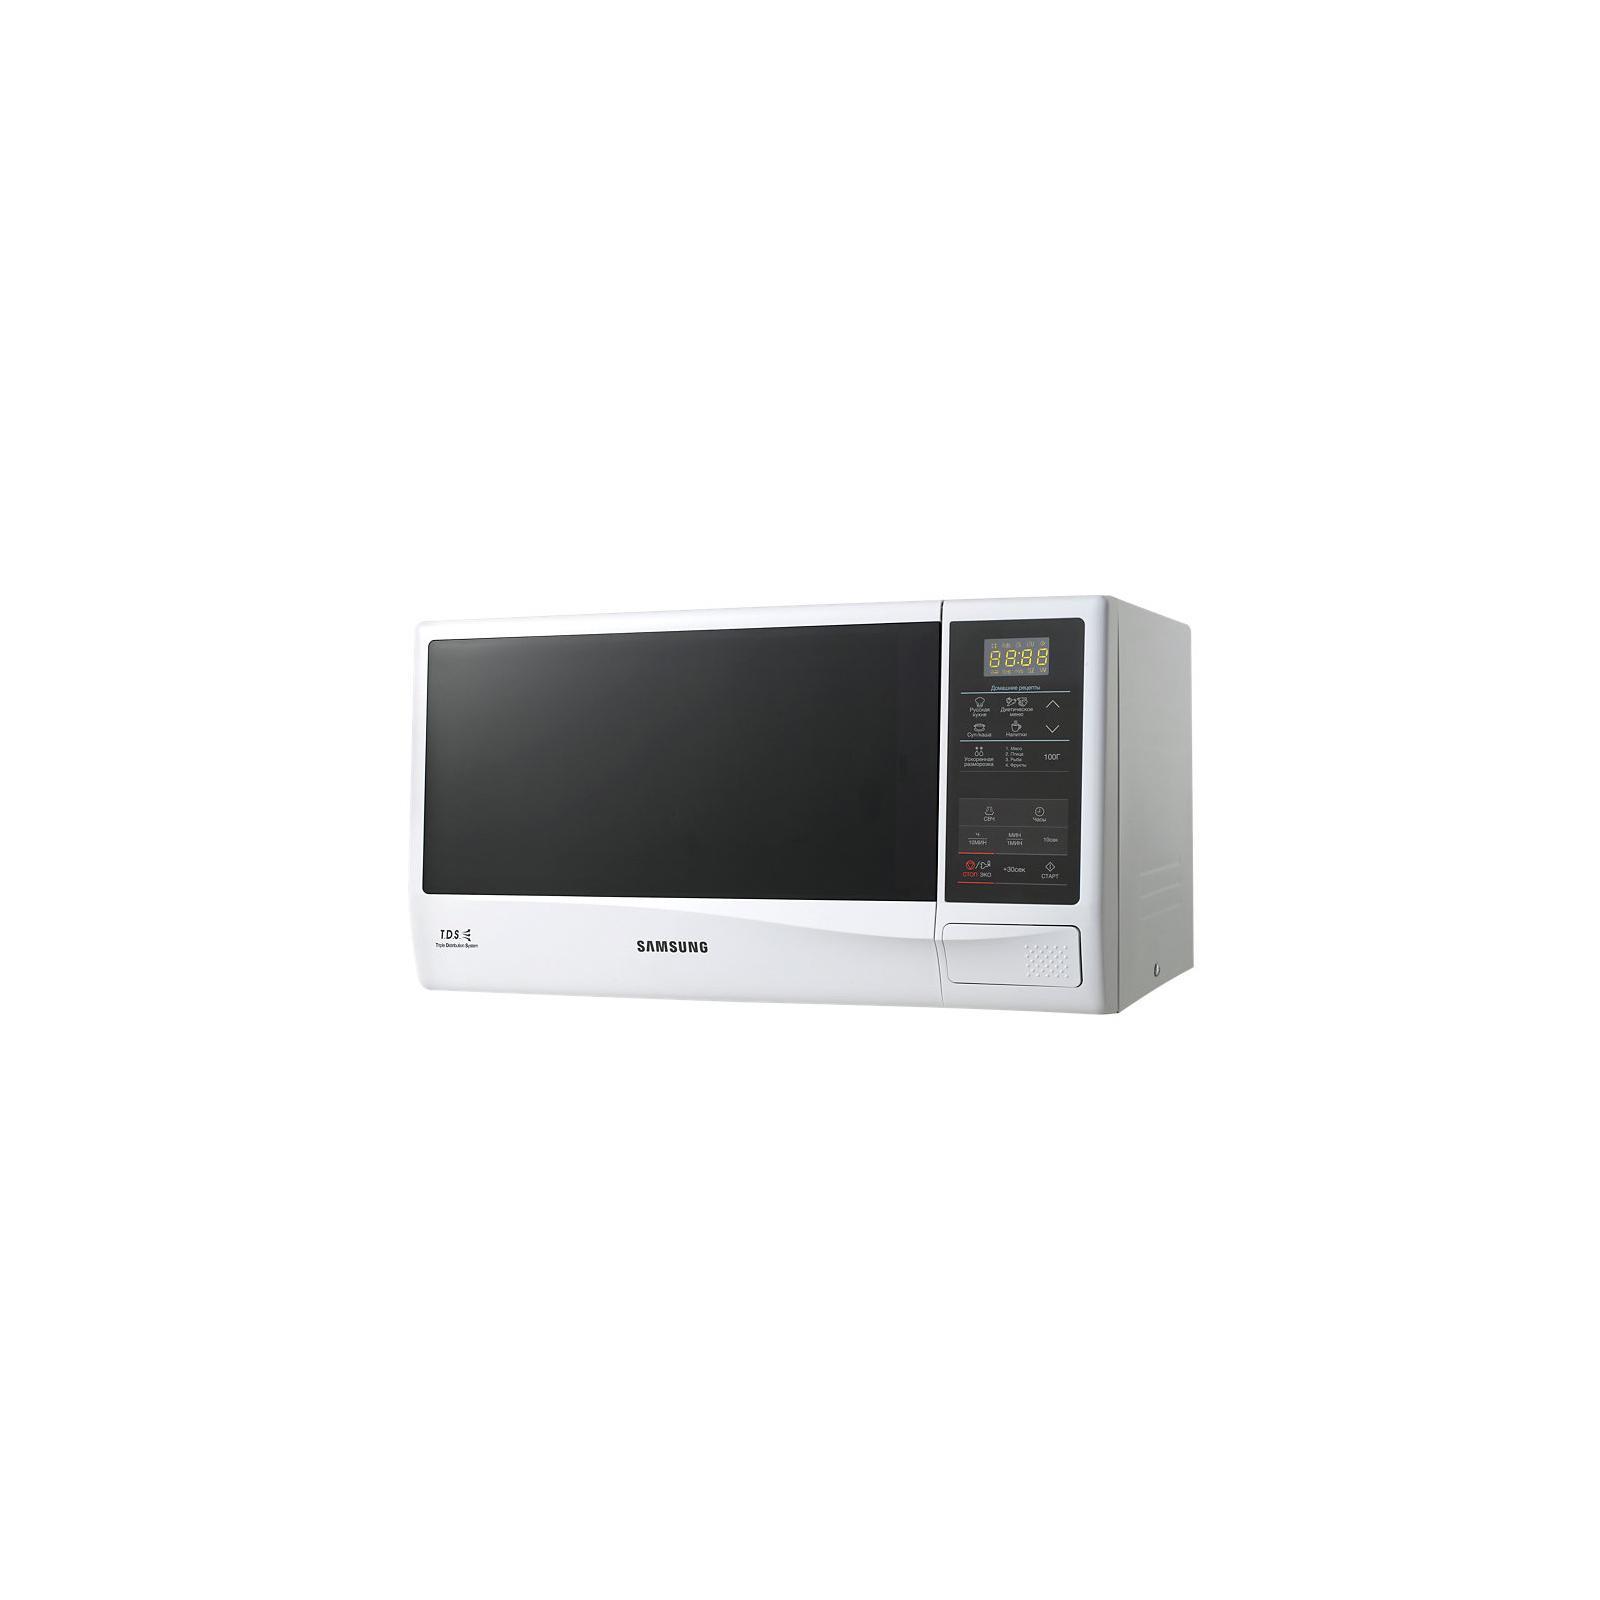 Микроволновая печь Samsung ME 83 KRW-2/BW (ME83KRW-2/BW) изображение 2